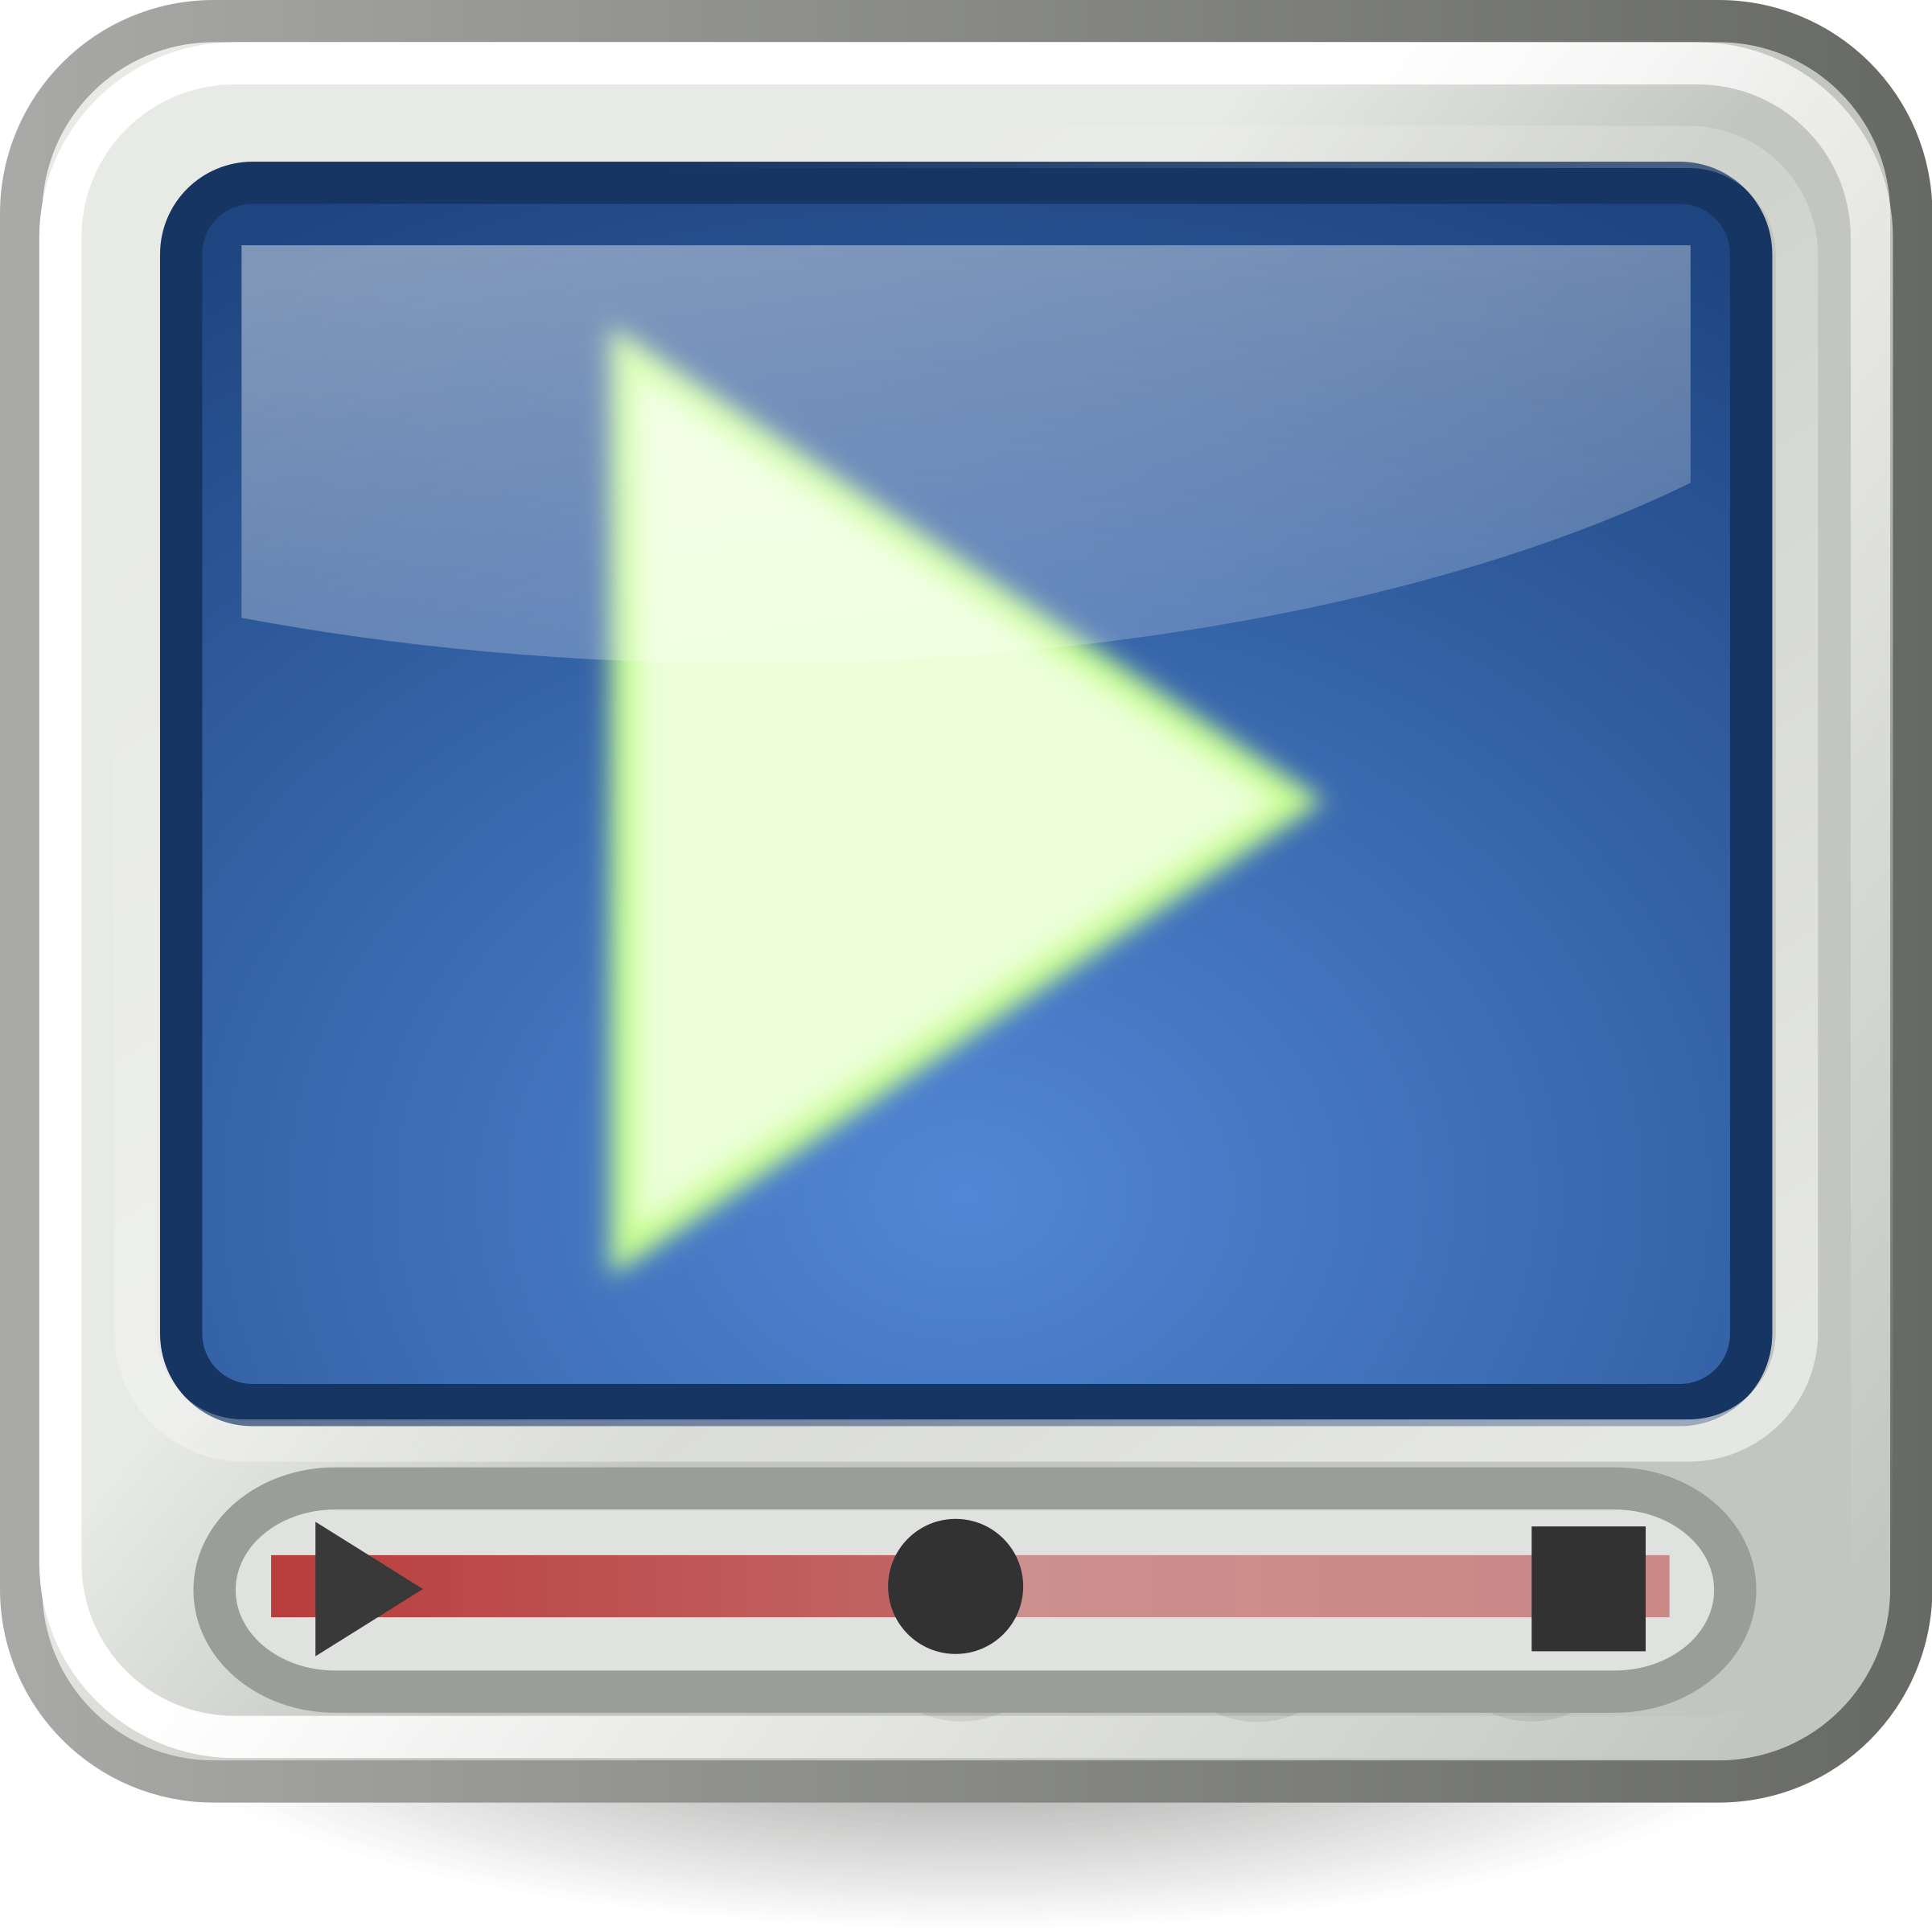 Clip art video.